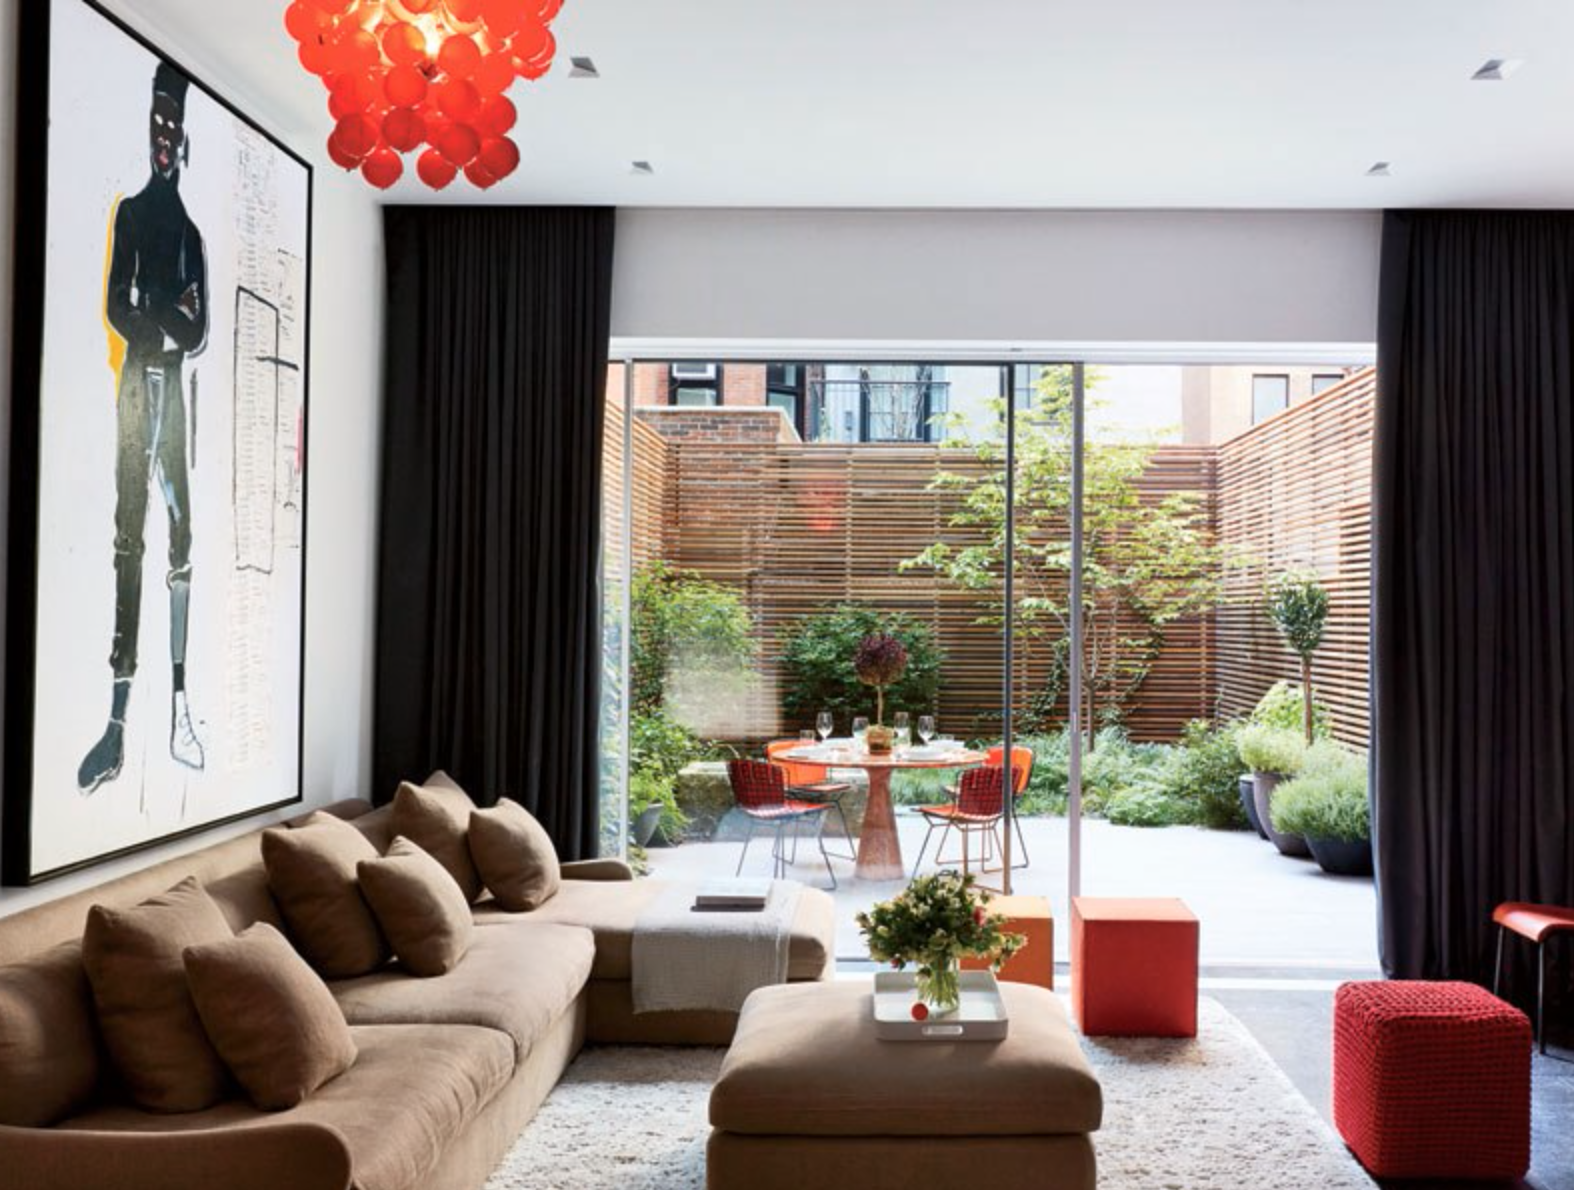 Terra os decorandoonline for Sillones para terrazas cubiertas